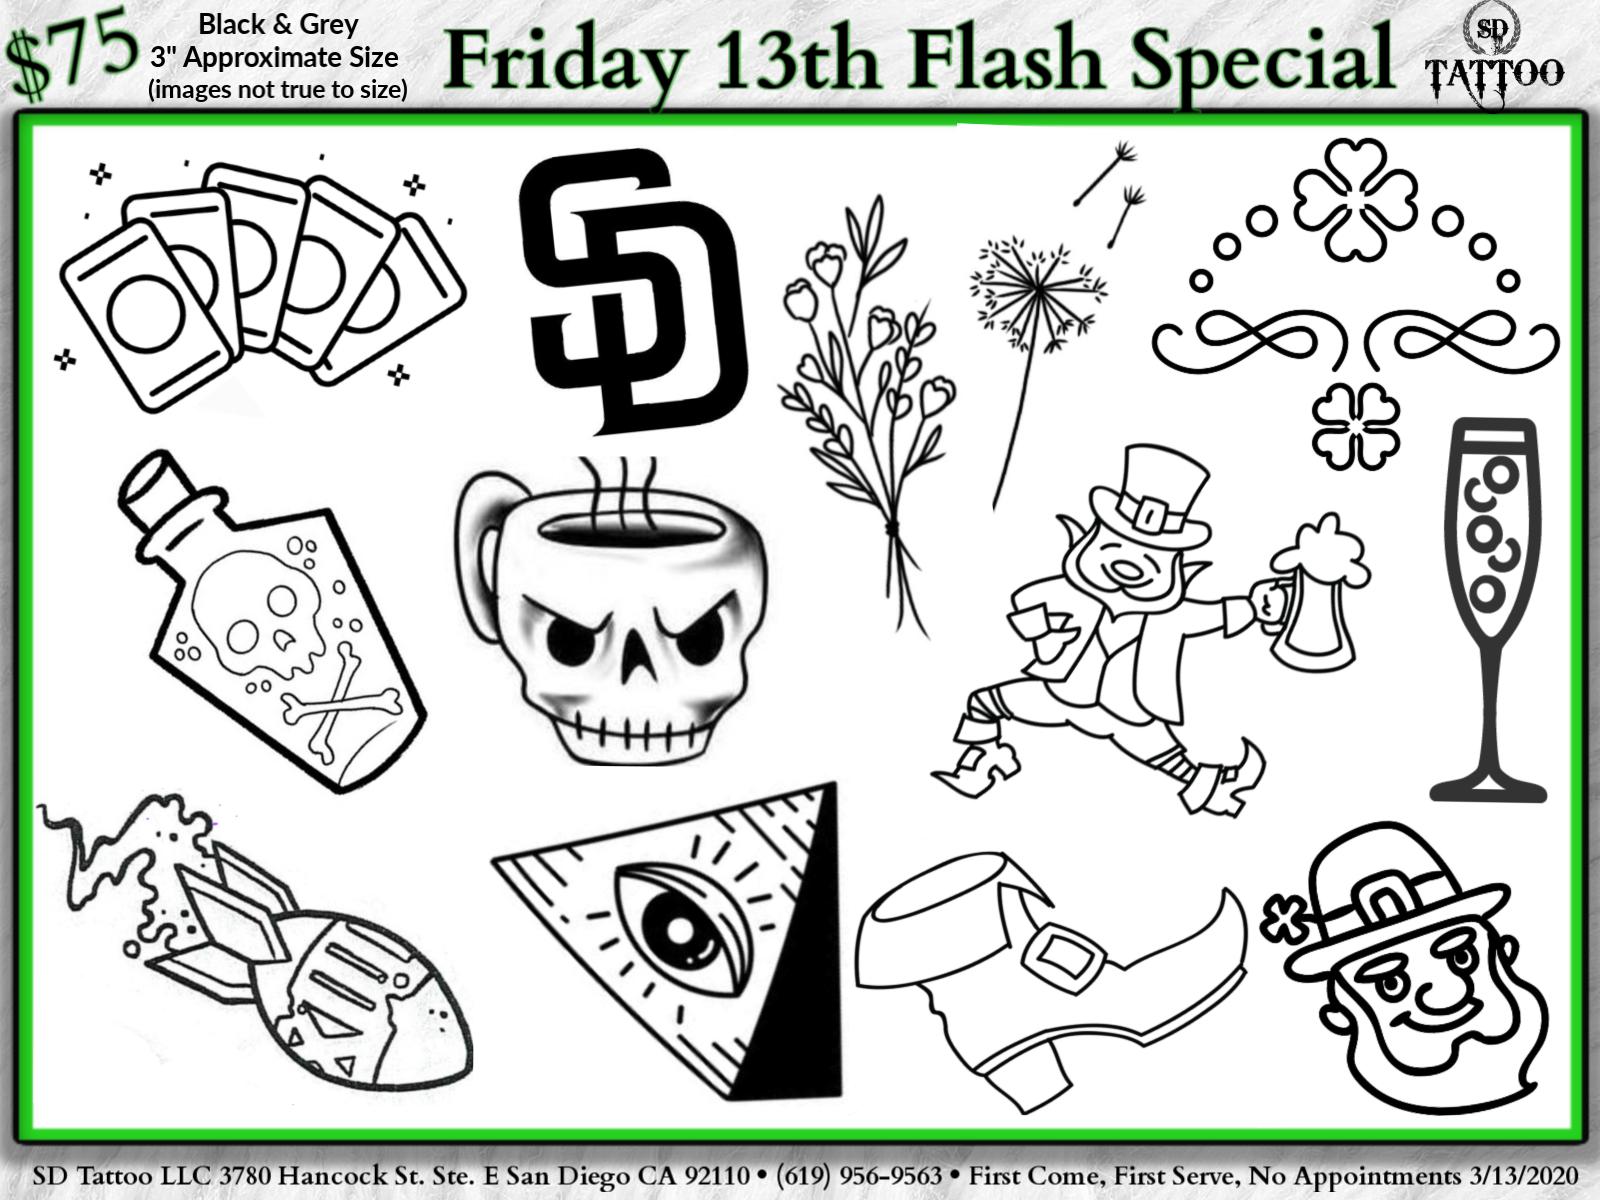 Sd Tattoo Friday 13th Event Flash Tattoo Piercing Discounts